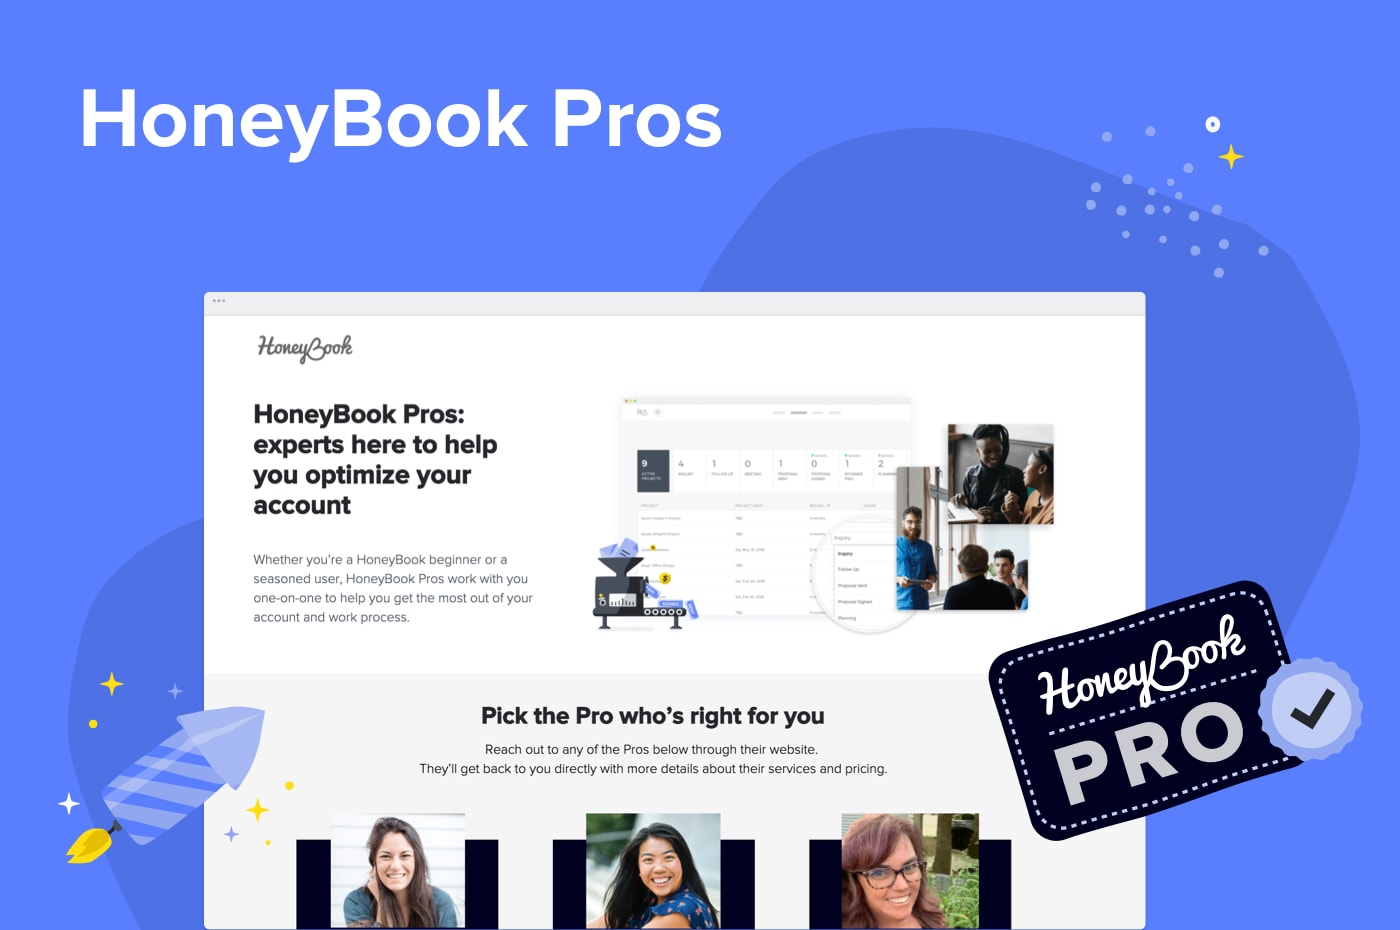 HoneyBook Pros